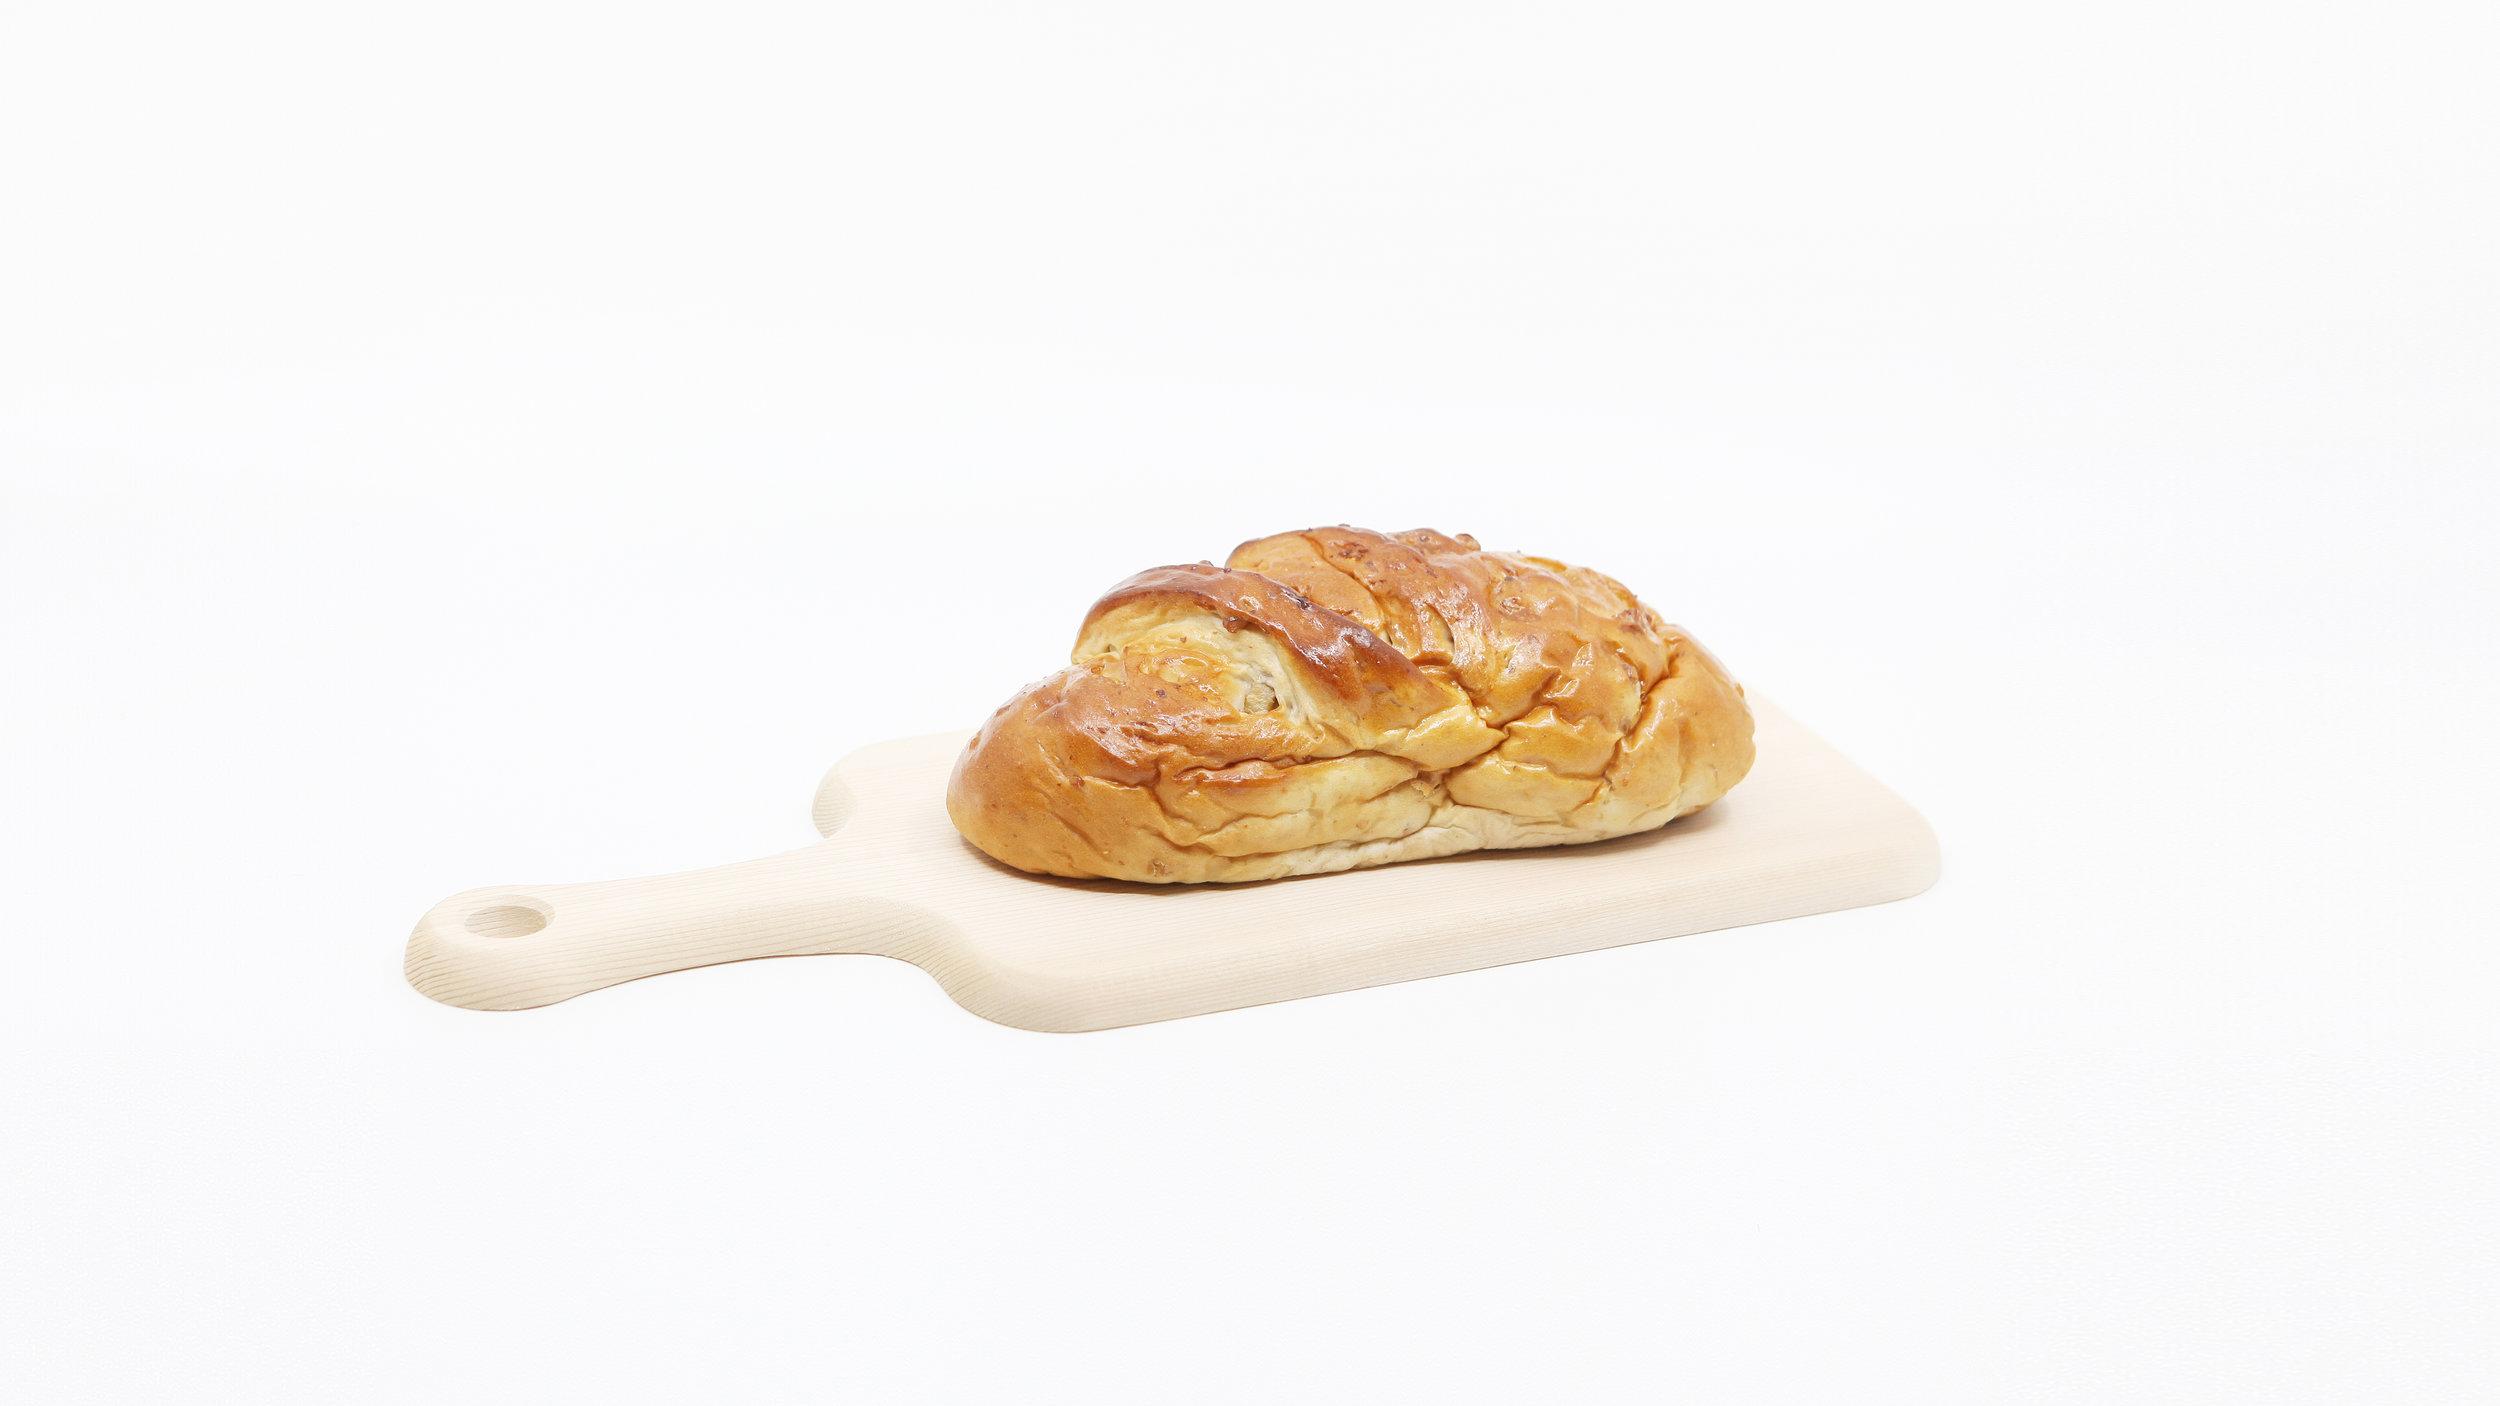 Foldio3_sample shot (bread).jpg